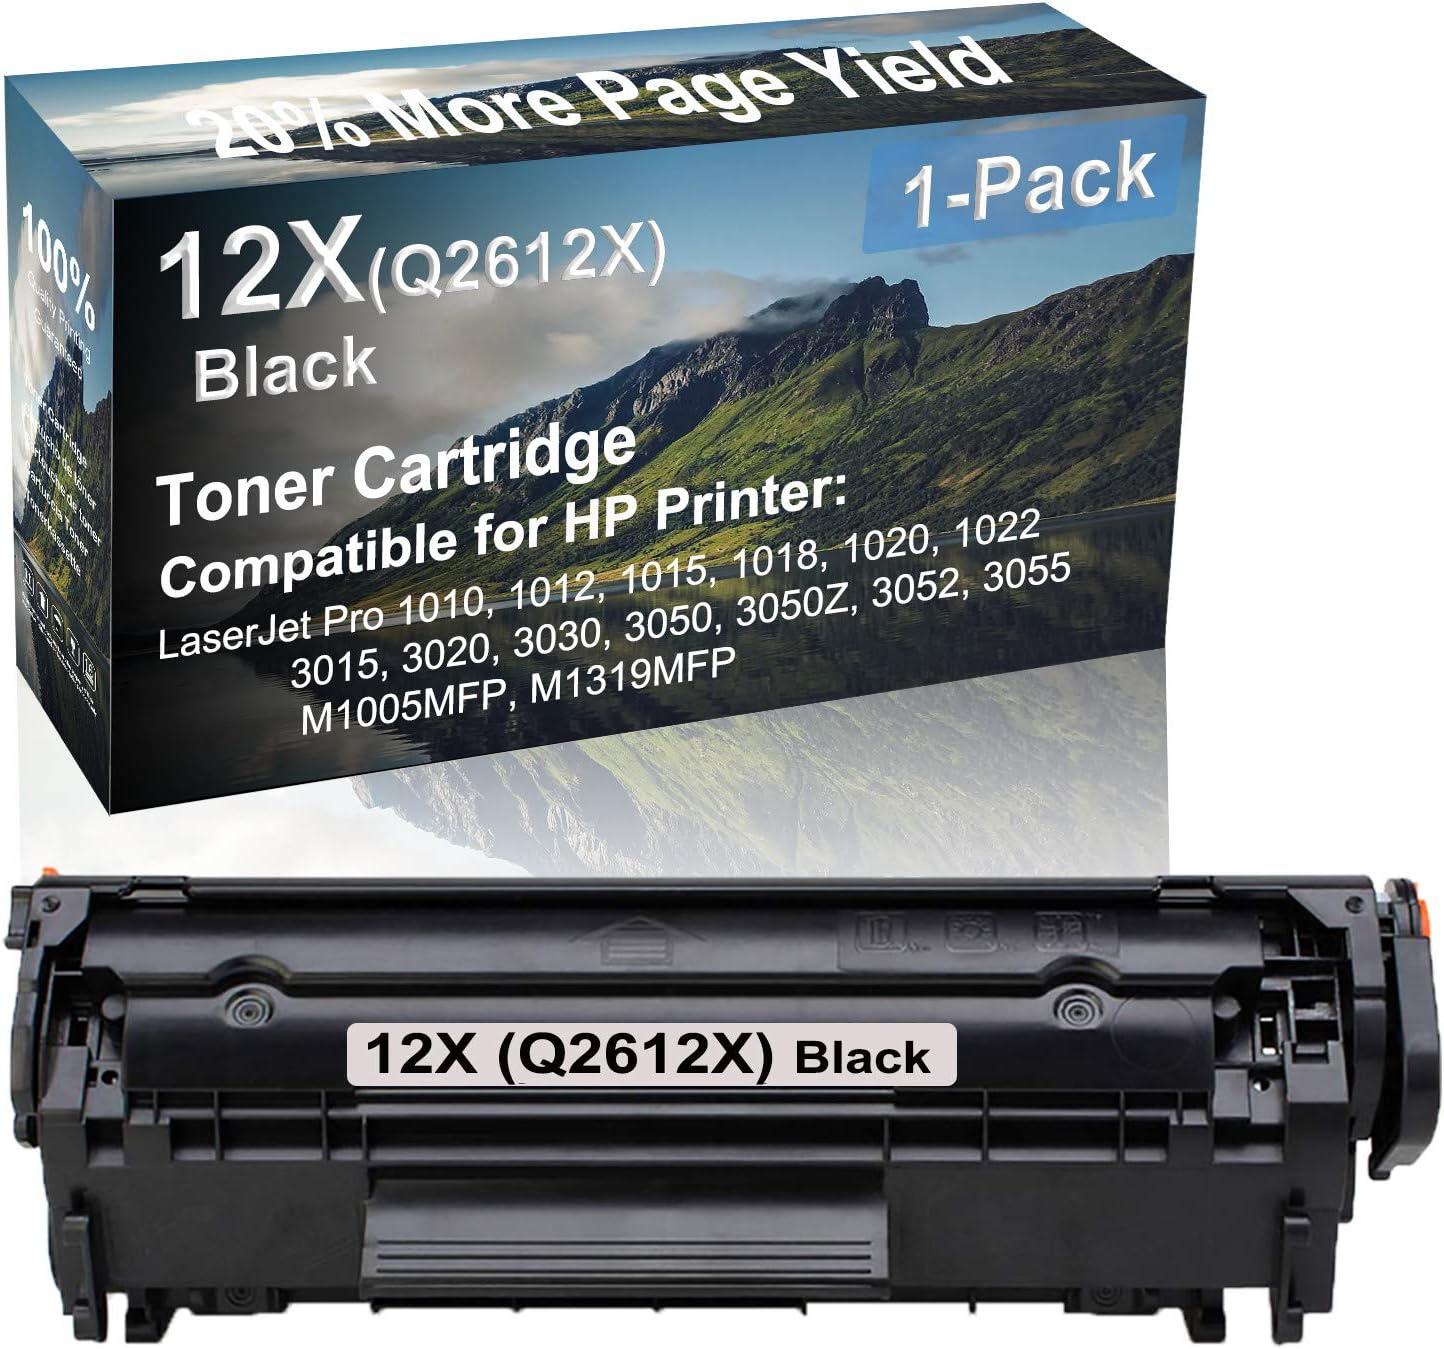 1-Pack Compatible High Yield 3050Z 3052 3055 M1005MFP M1319MFP Laser Printer Toner Cartridge Replacement for HP 12X (Q2612X) Printer Cartridge (Black)